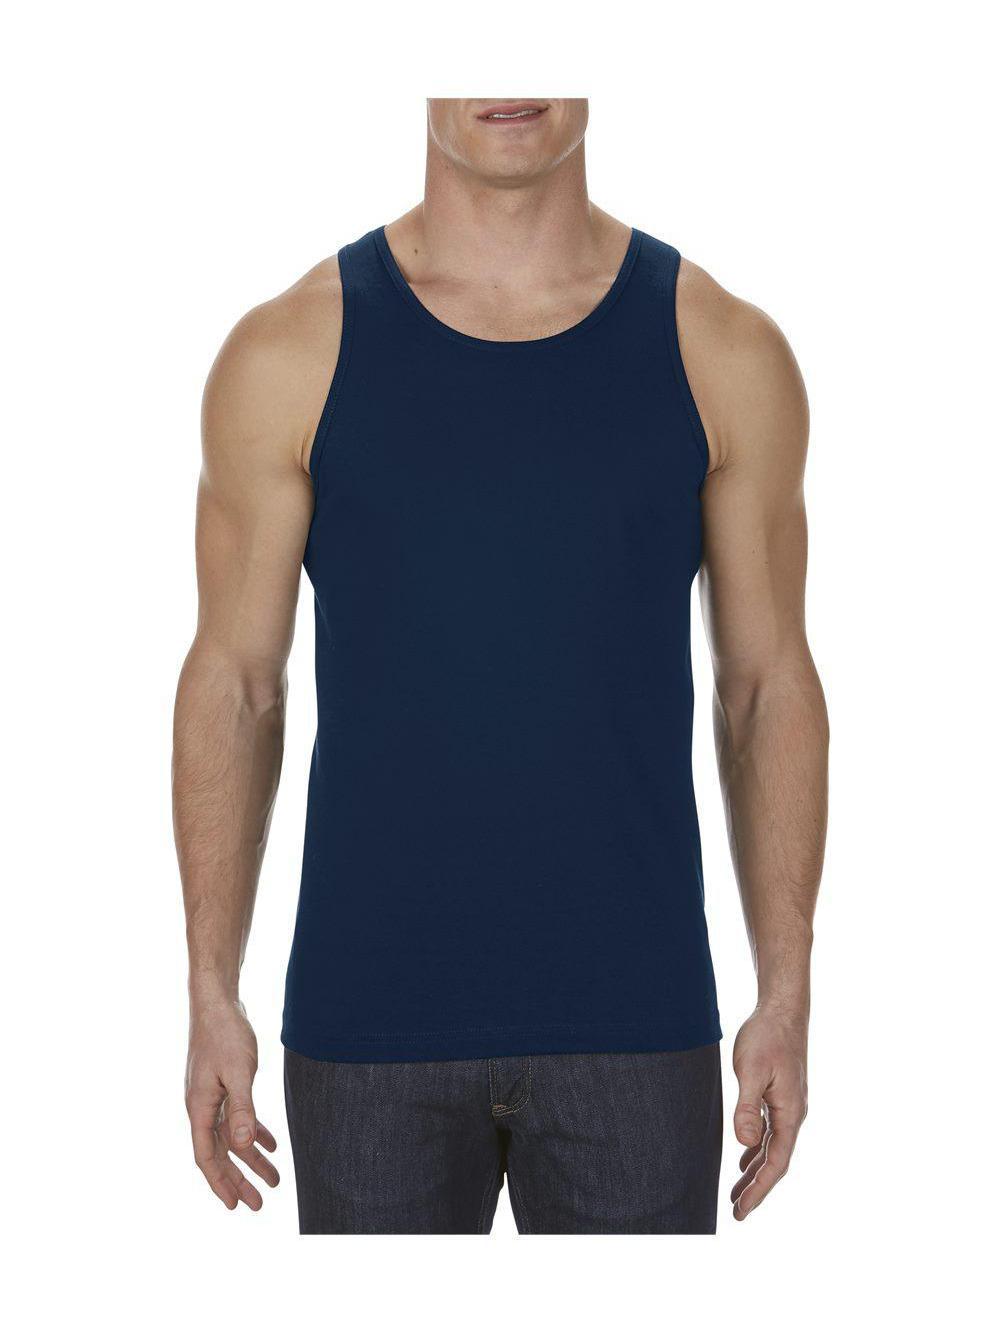 AAA 1307 ALSTYLE APPAREL MENS TANK TOP PLAIN SLEEVELESS T SHIRT MUSCLE SHIRTS